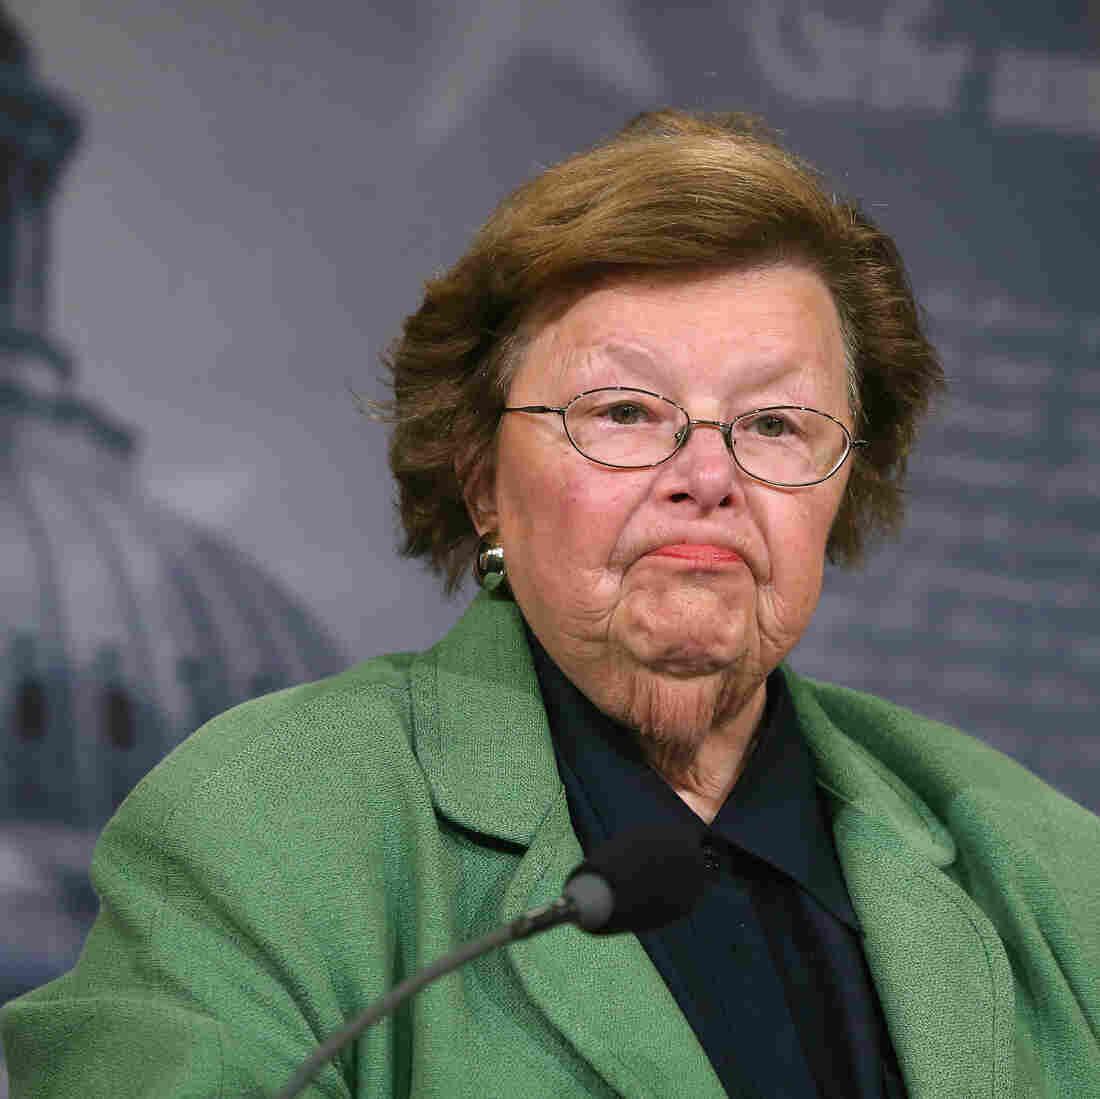 Sen. Barbara Mikulski, Congress' Longest-Serving Woman, To Retire